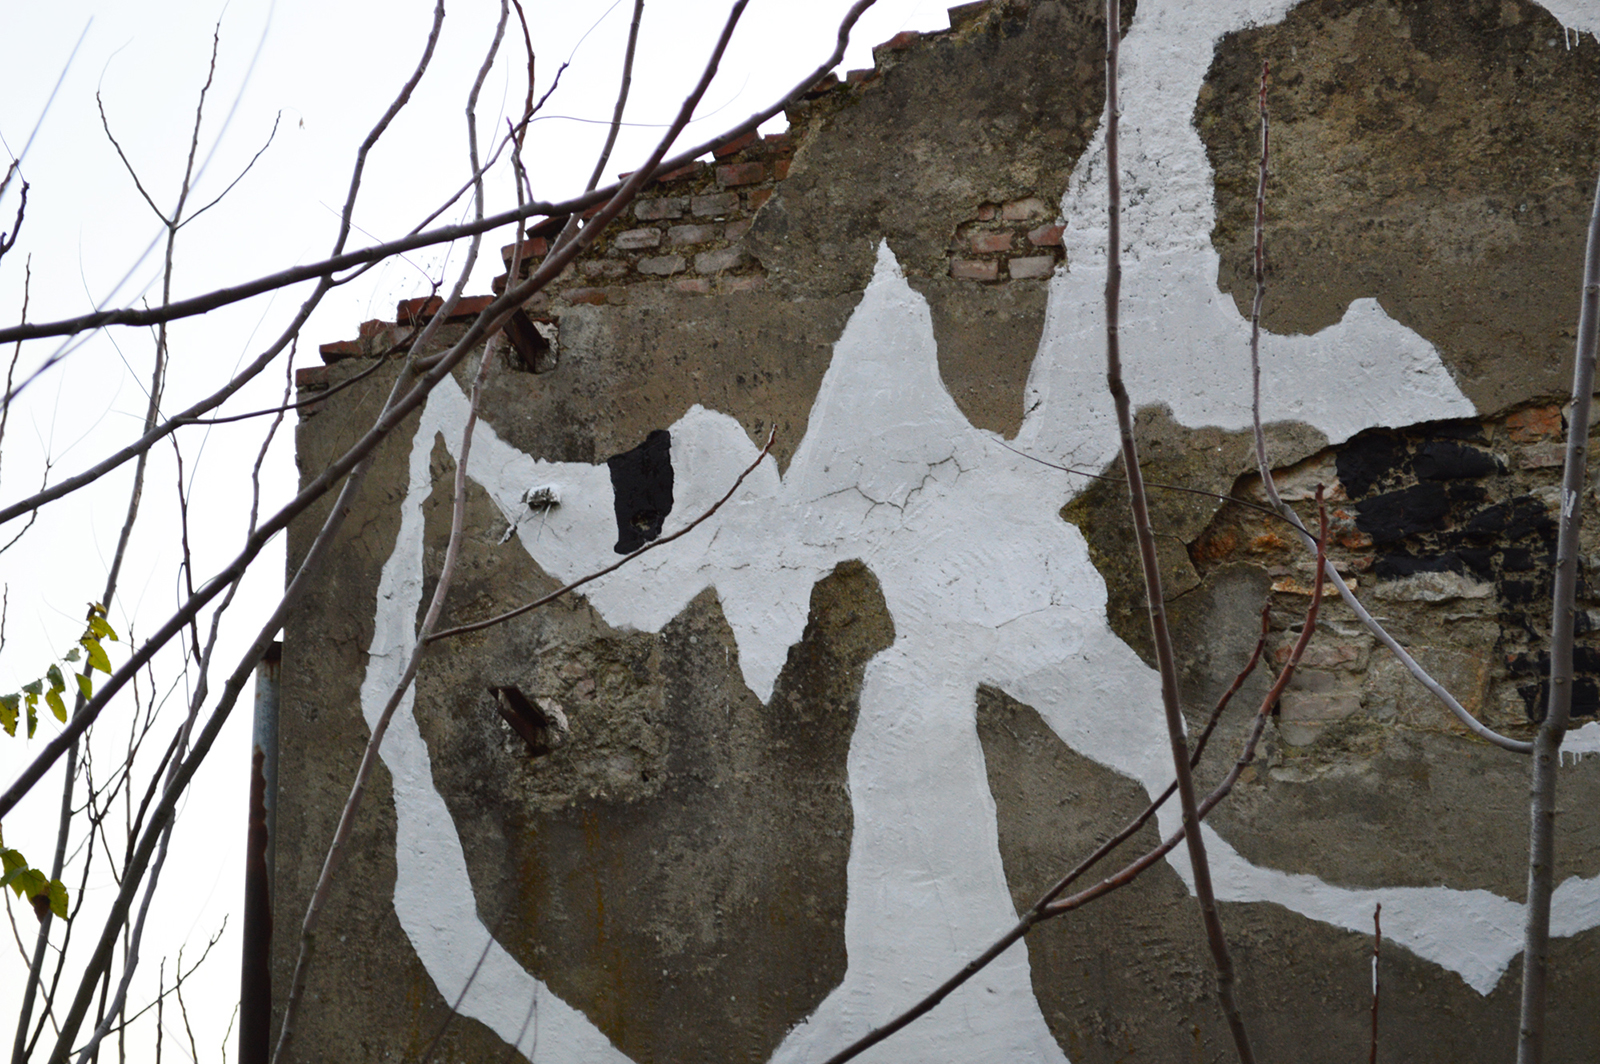 moallaseconda-new-mural-in-prato-04